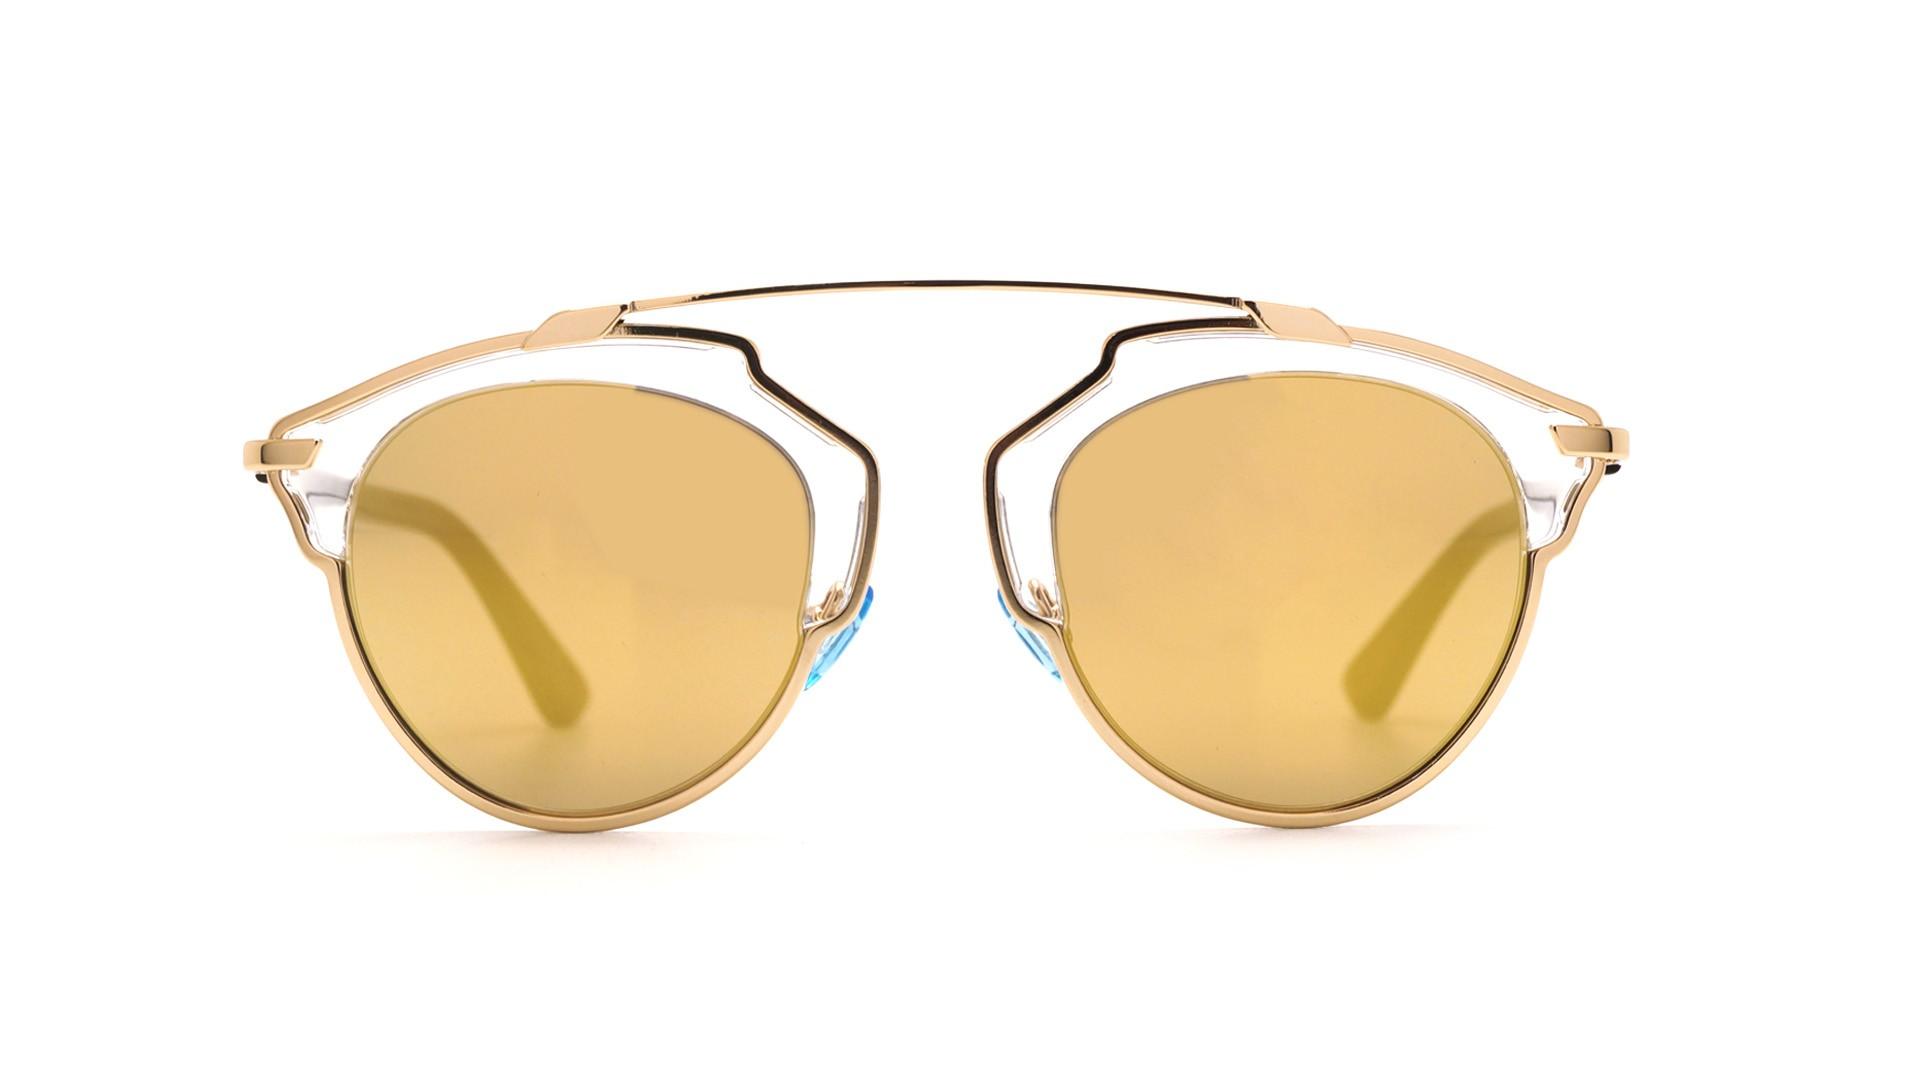 b500459a21 Lunettes de soleil Dior Soreal Or U5SK1 48-22 Medium Miroirs